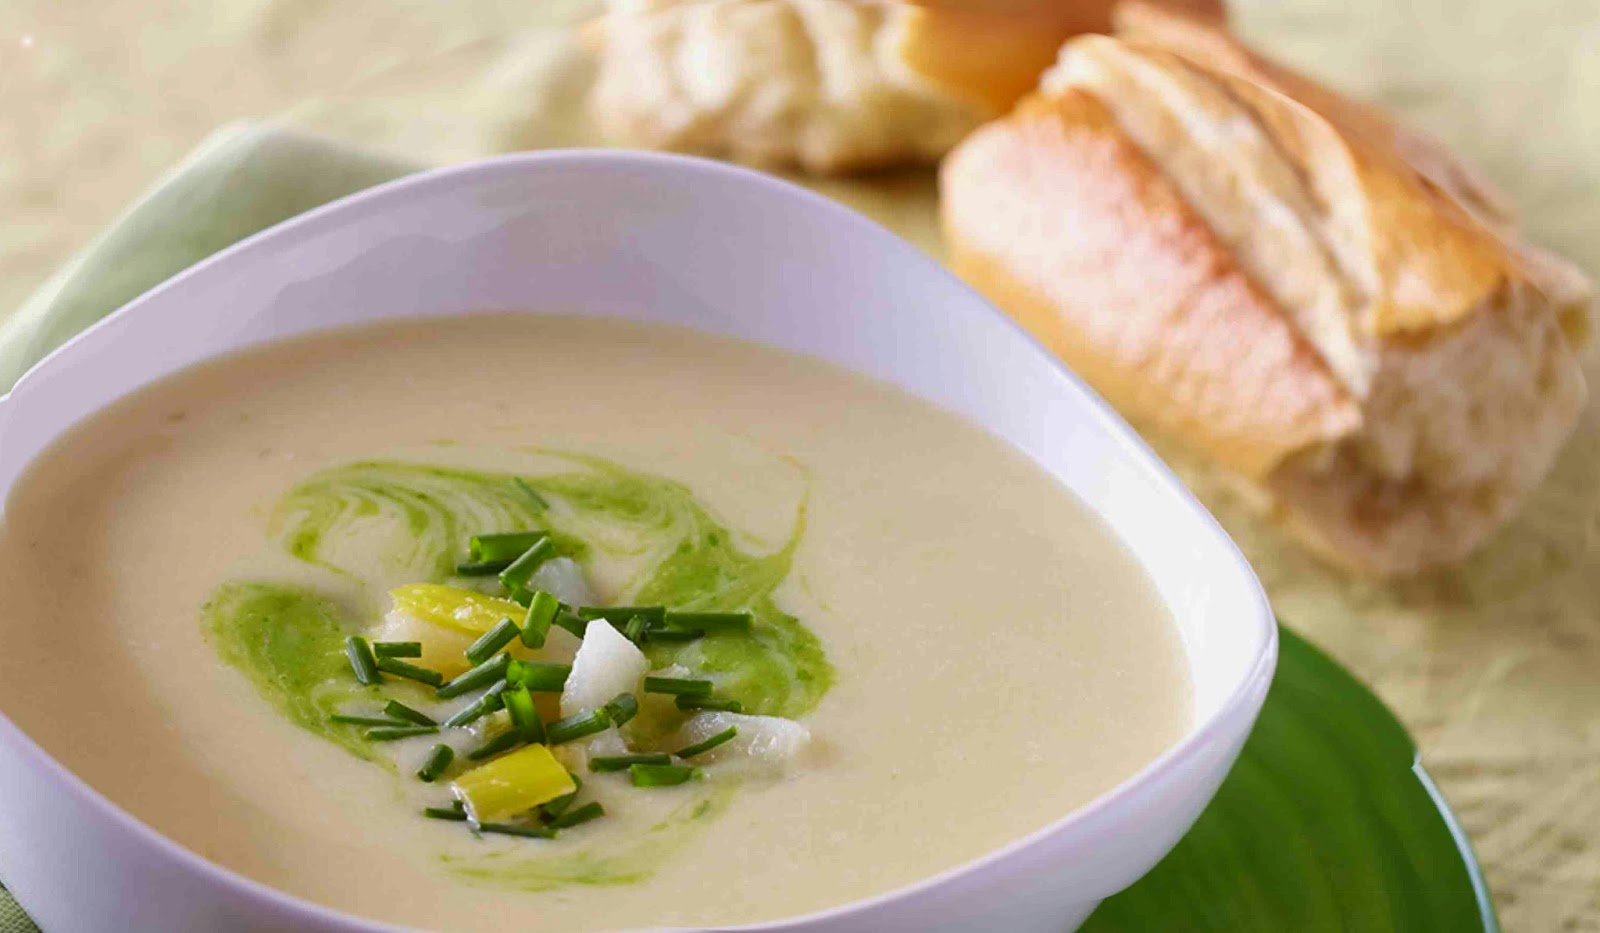 Healthy Vegan Leek Soup Modern Recipe Game Of Thrones Food Recipes